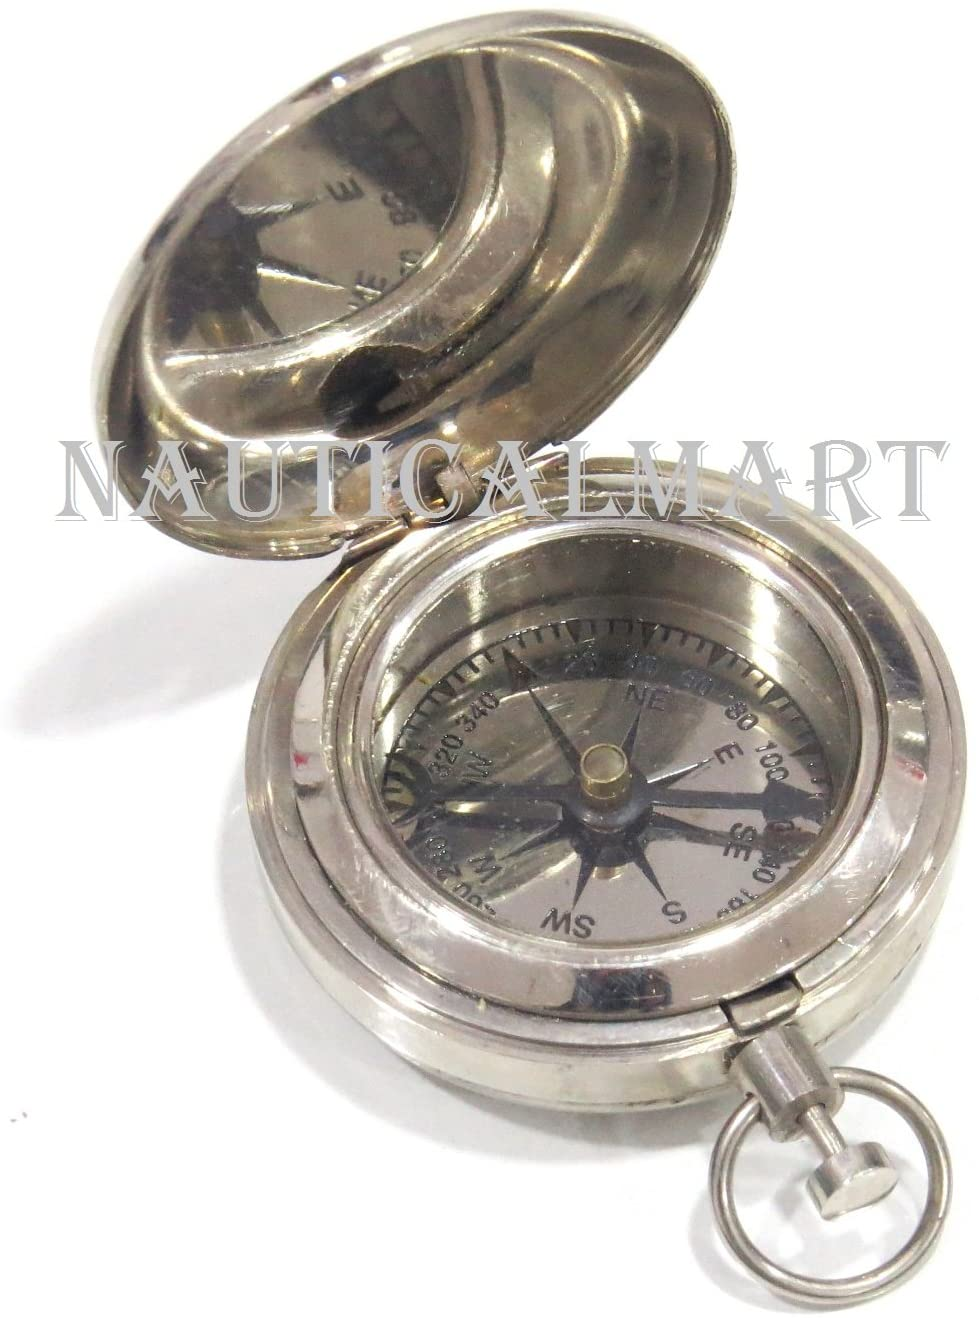 NauticalMart Pocket Compass Chrome Plated Camping Nautical Gift Vintage